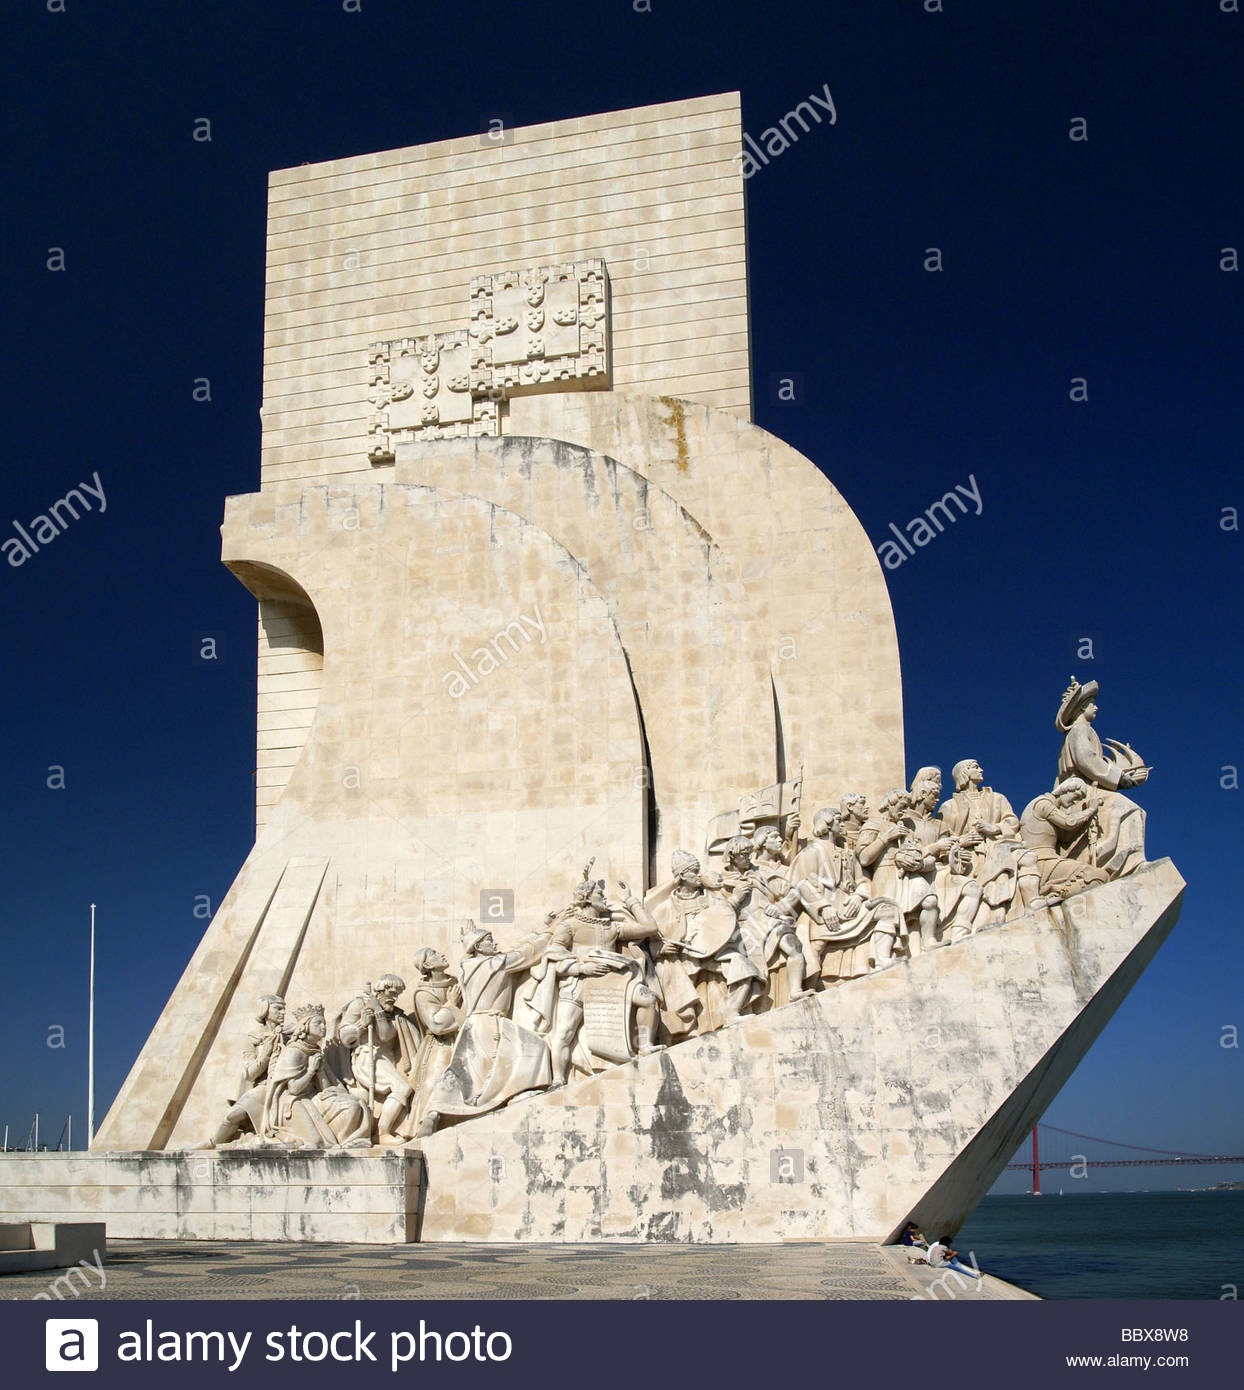 Padrão Dos Descobrimentos - Lisboa | Denkmal der Entdeckungen in der Belém-Pfarrei des Lissabon - Portugal Stockbild